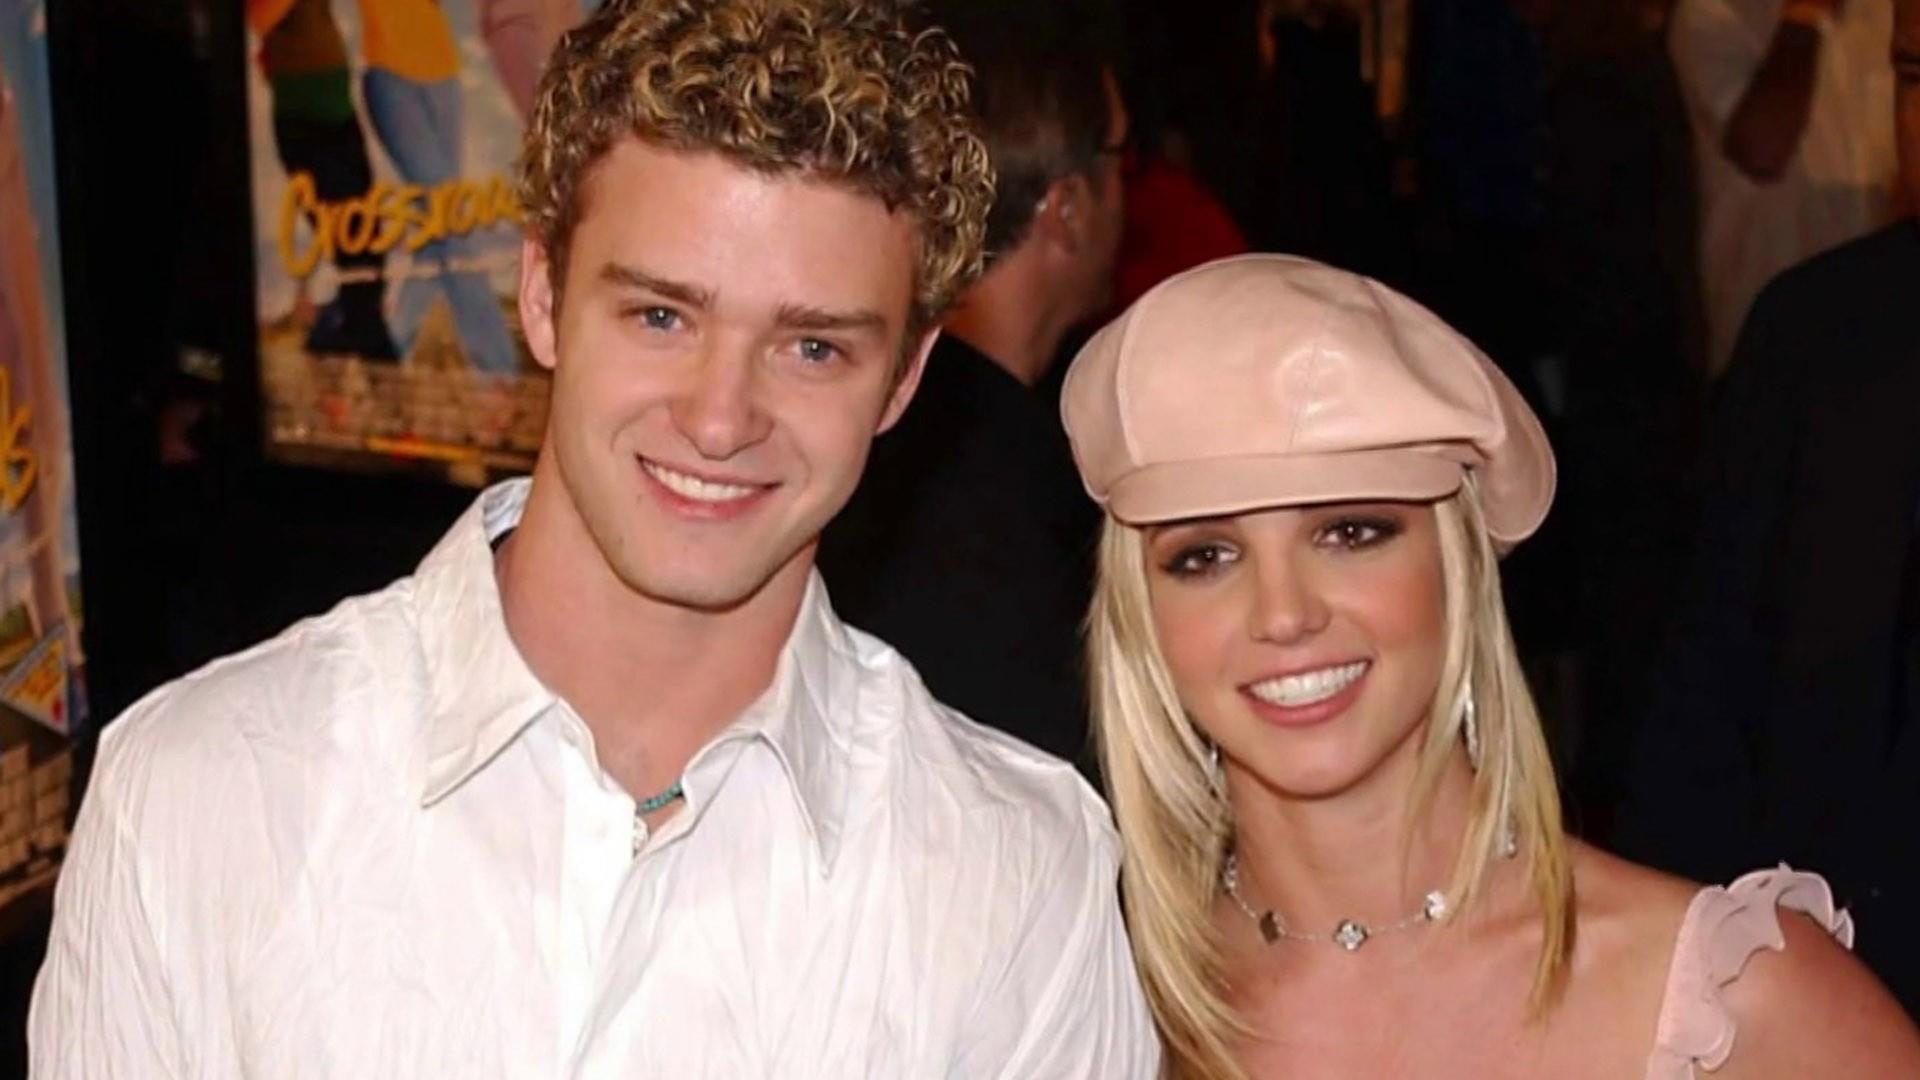 Britney Spears Justin Timberlakes Joke About Breakup On Instagram